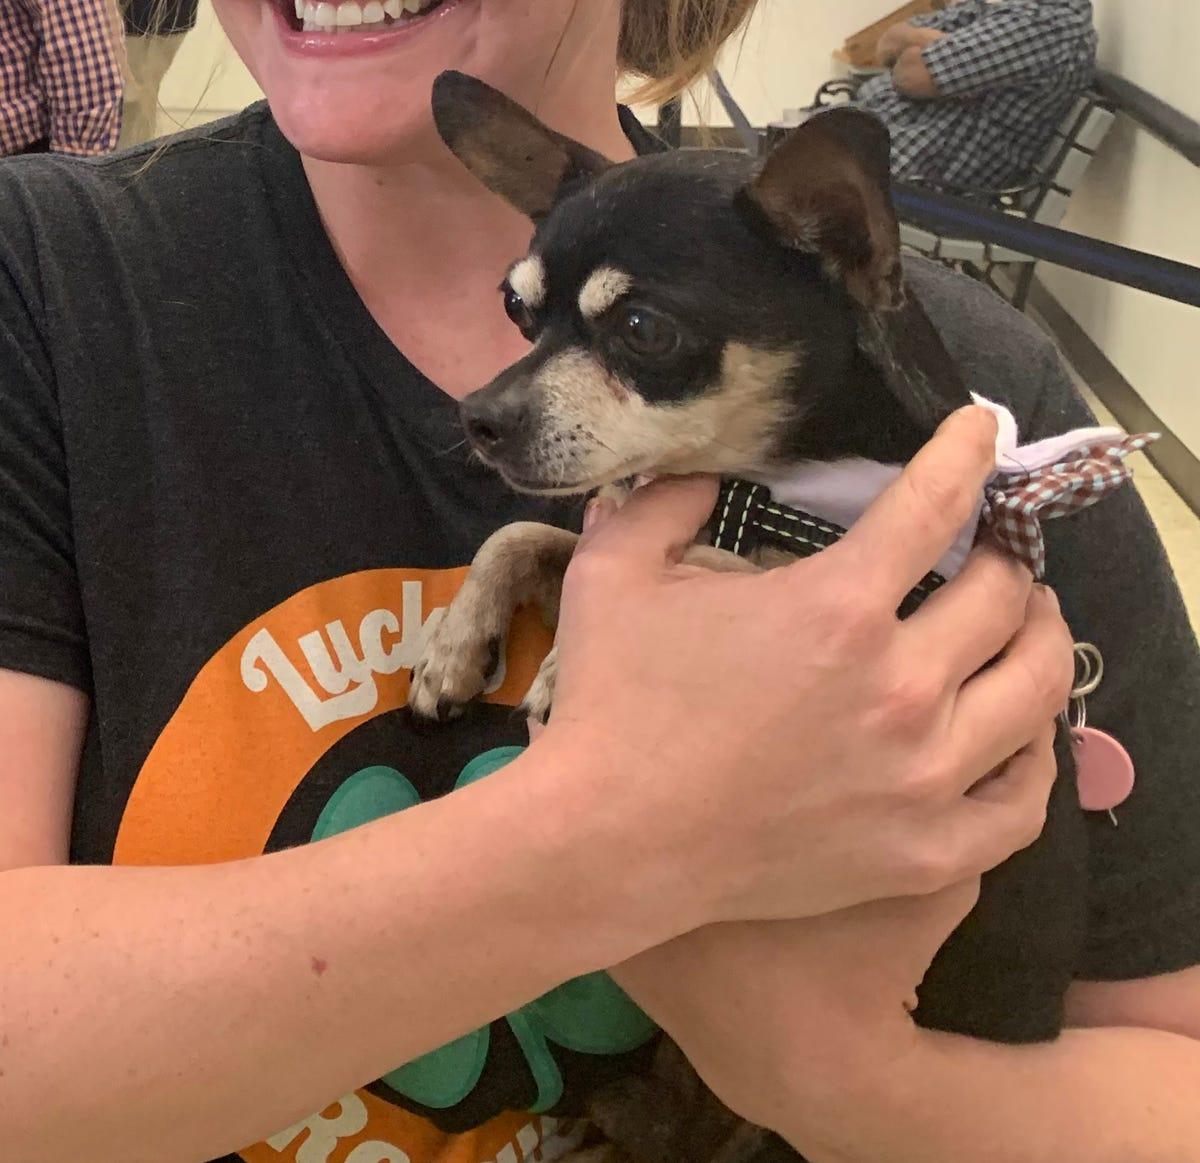 Stolen pup, Zoro, was recovered